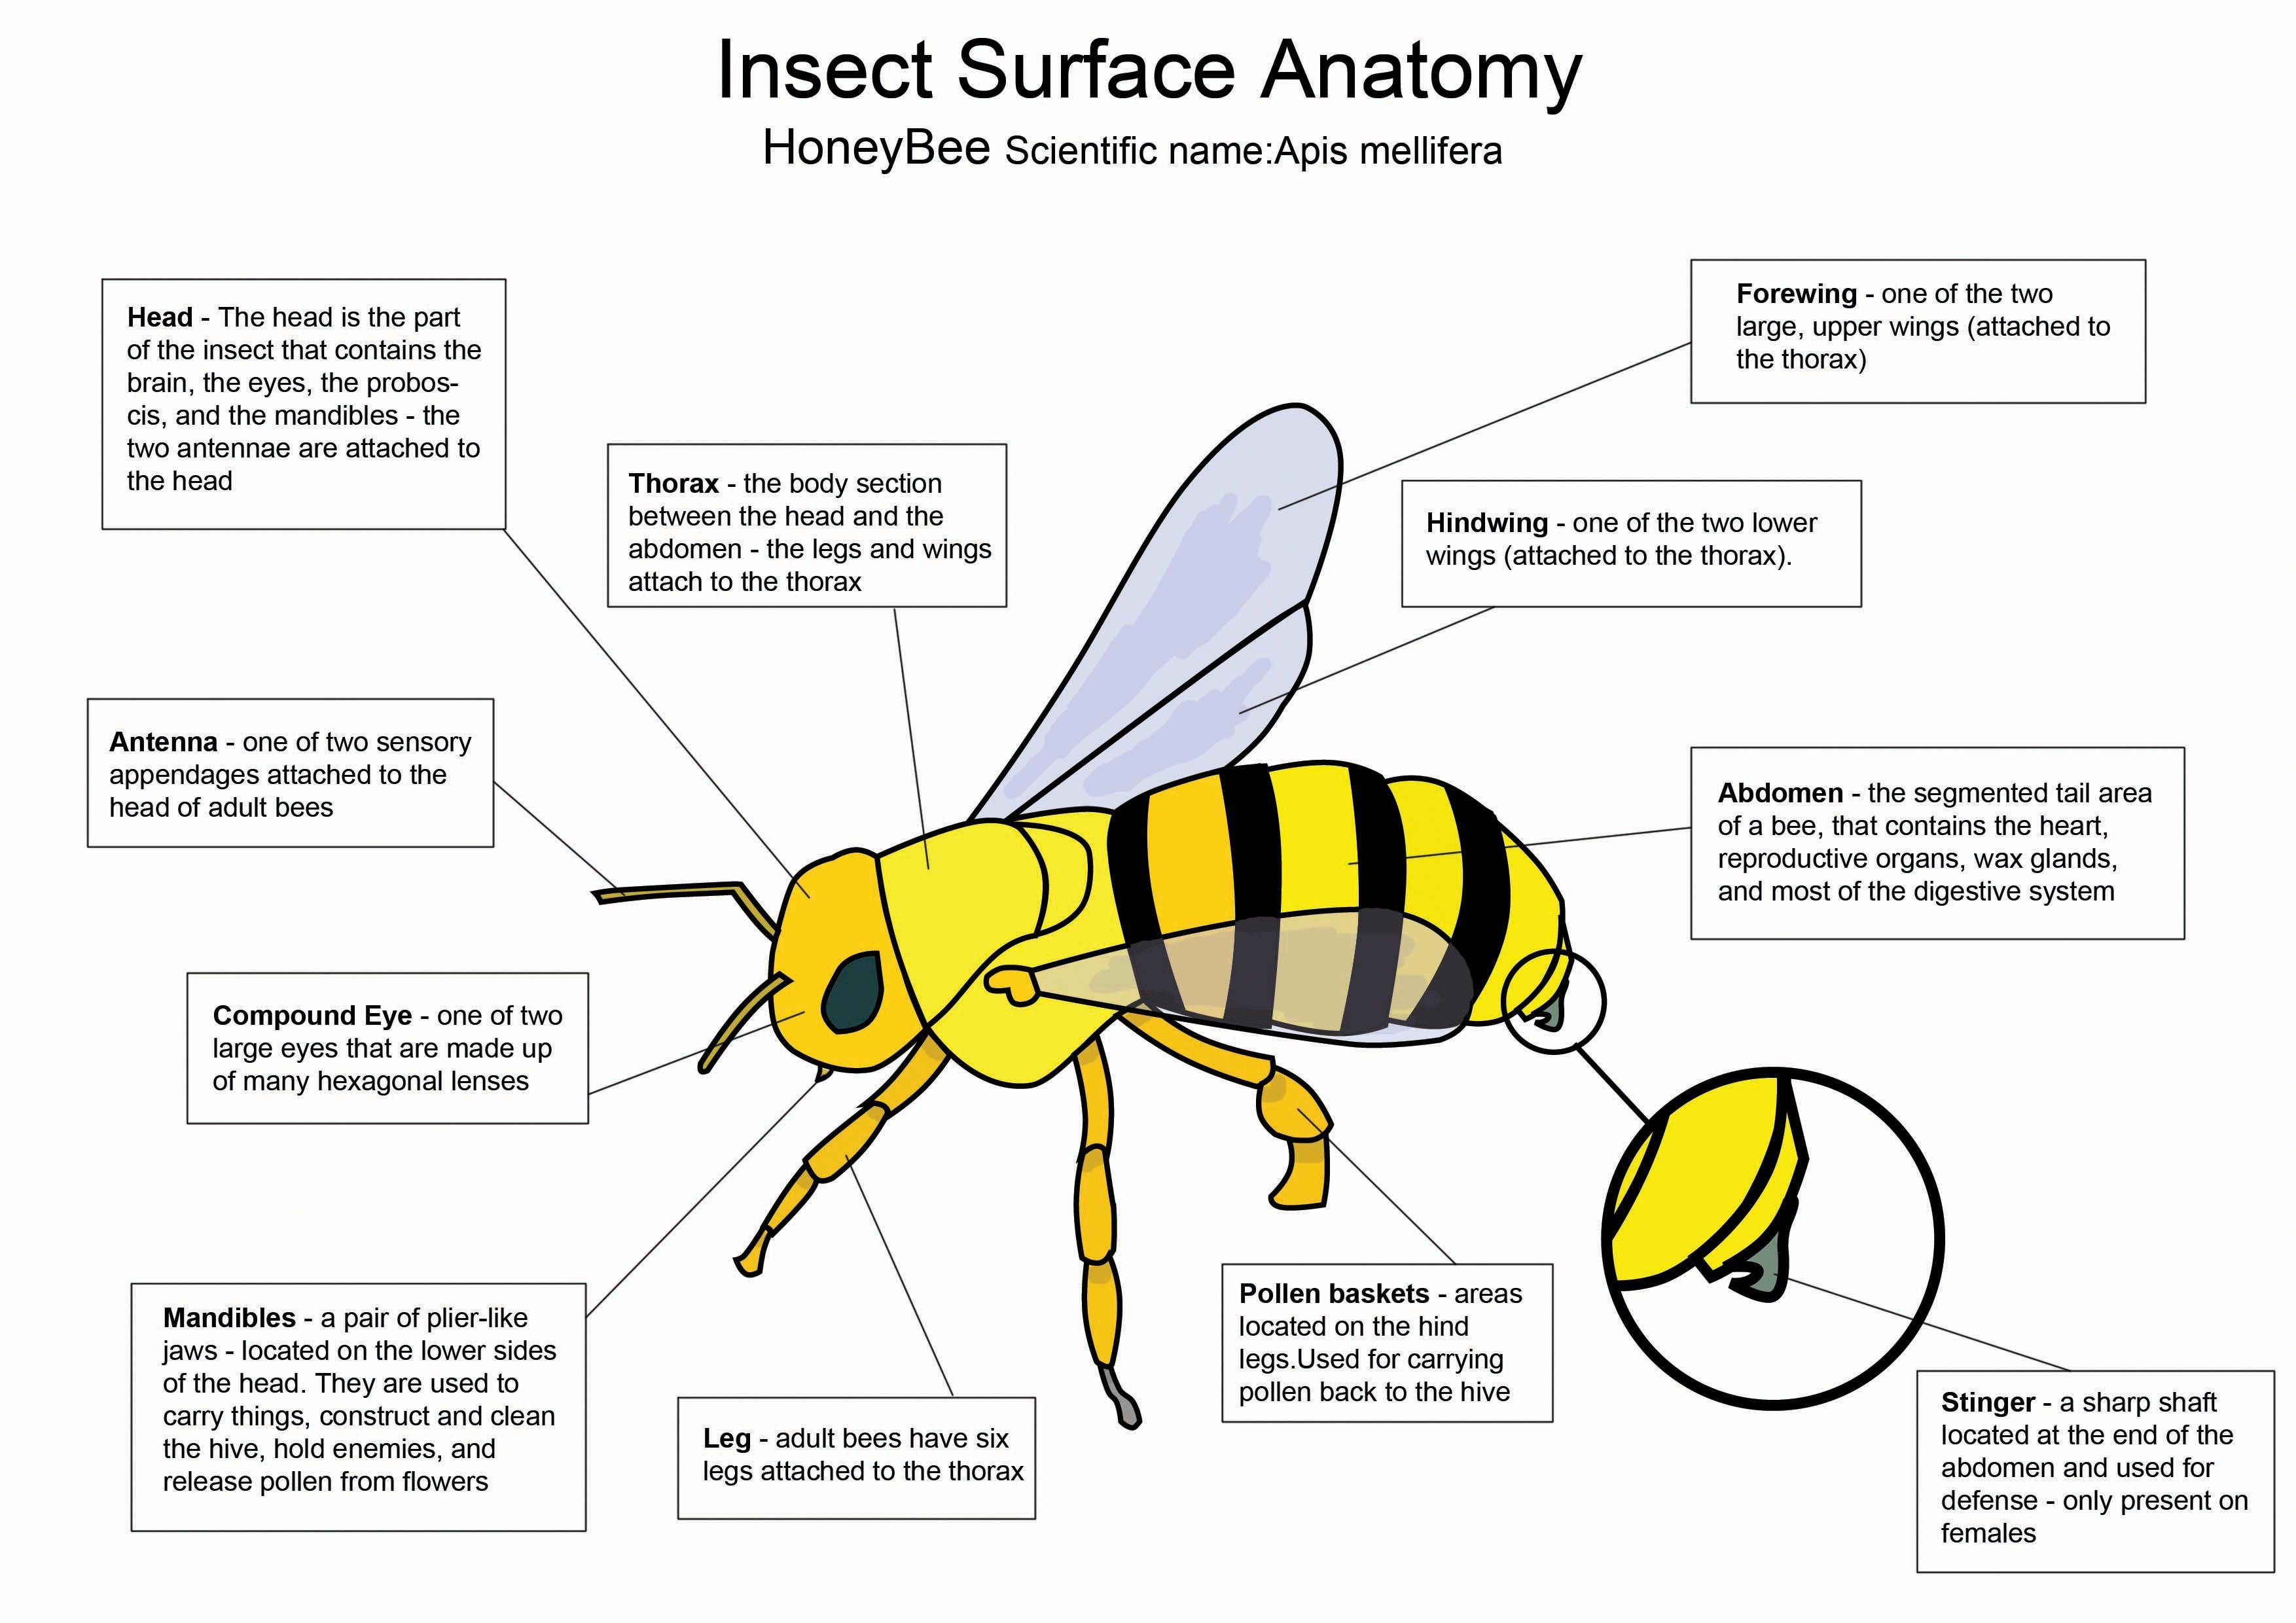 medium resolution of honey bee diagram by crazyhobo deviantart com on deviantart